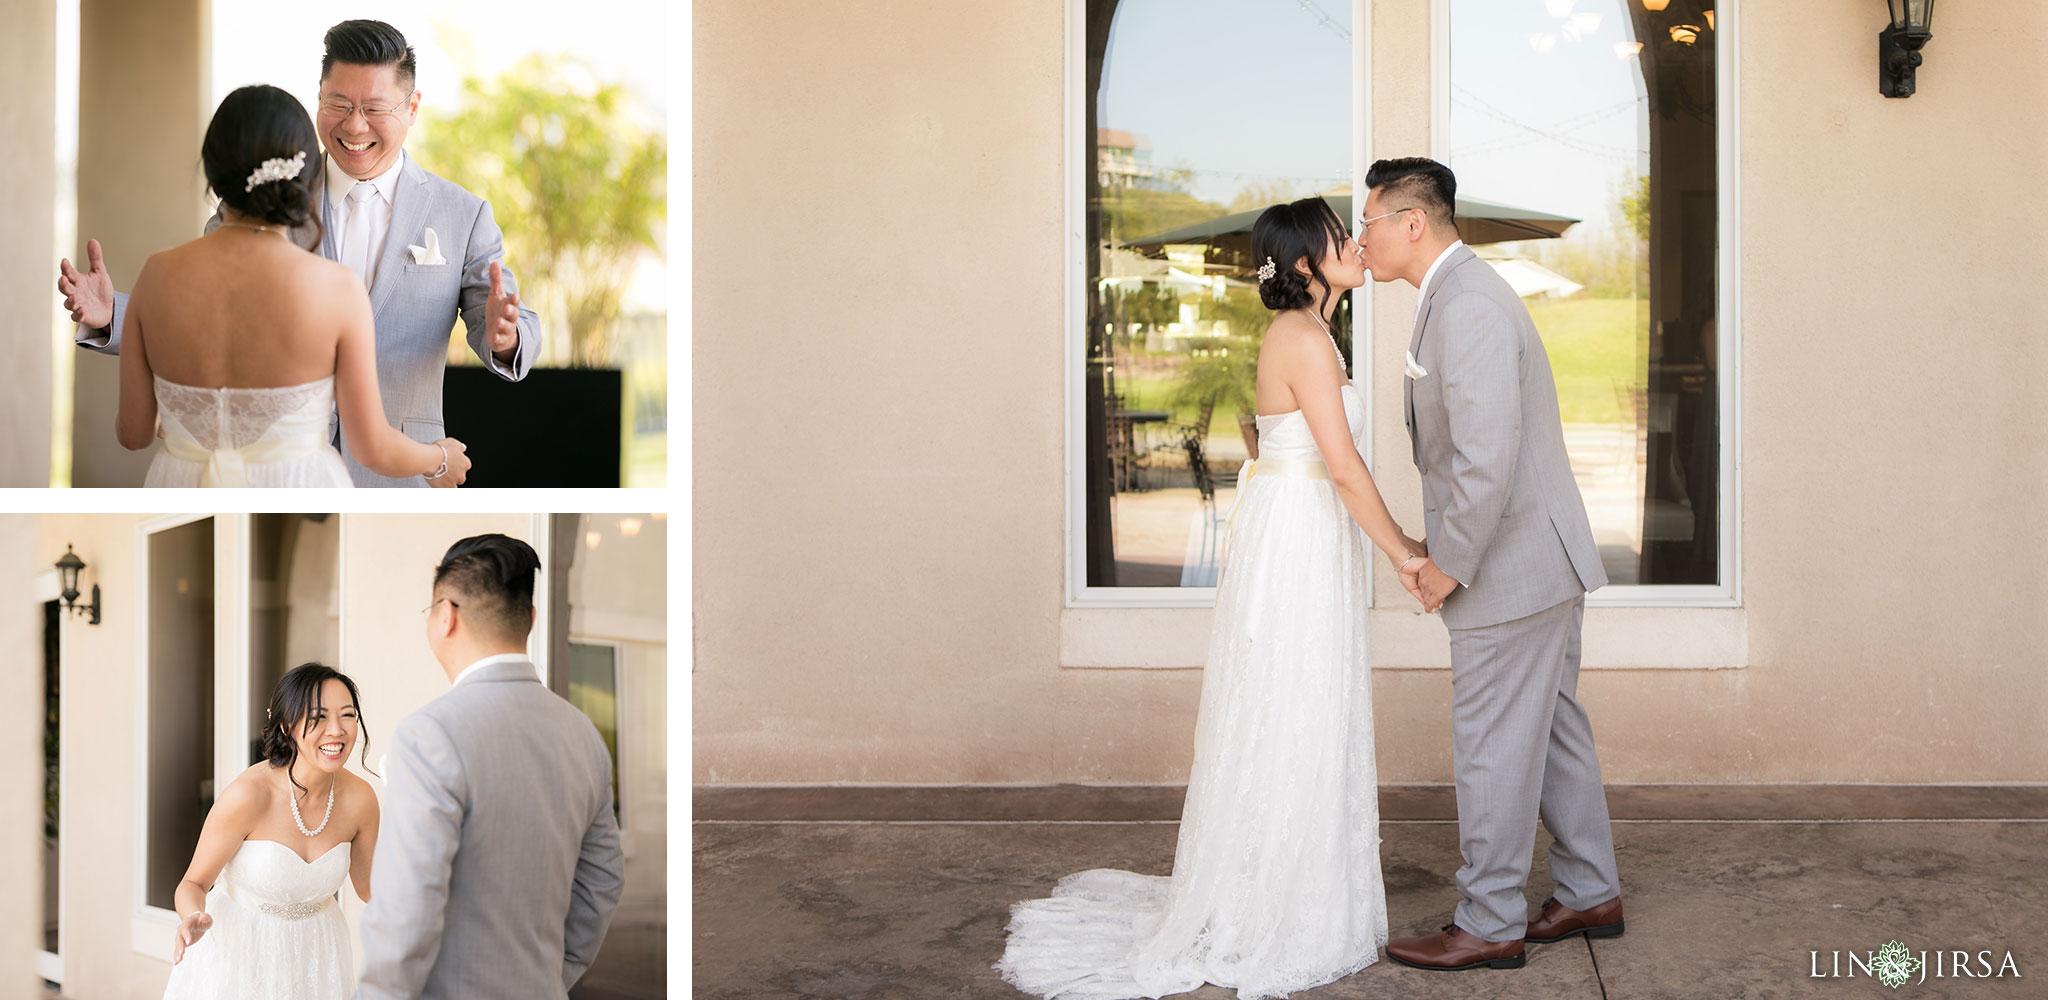 08 westridge golf club la habra first look wedding photography